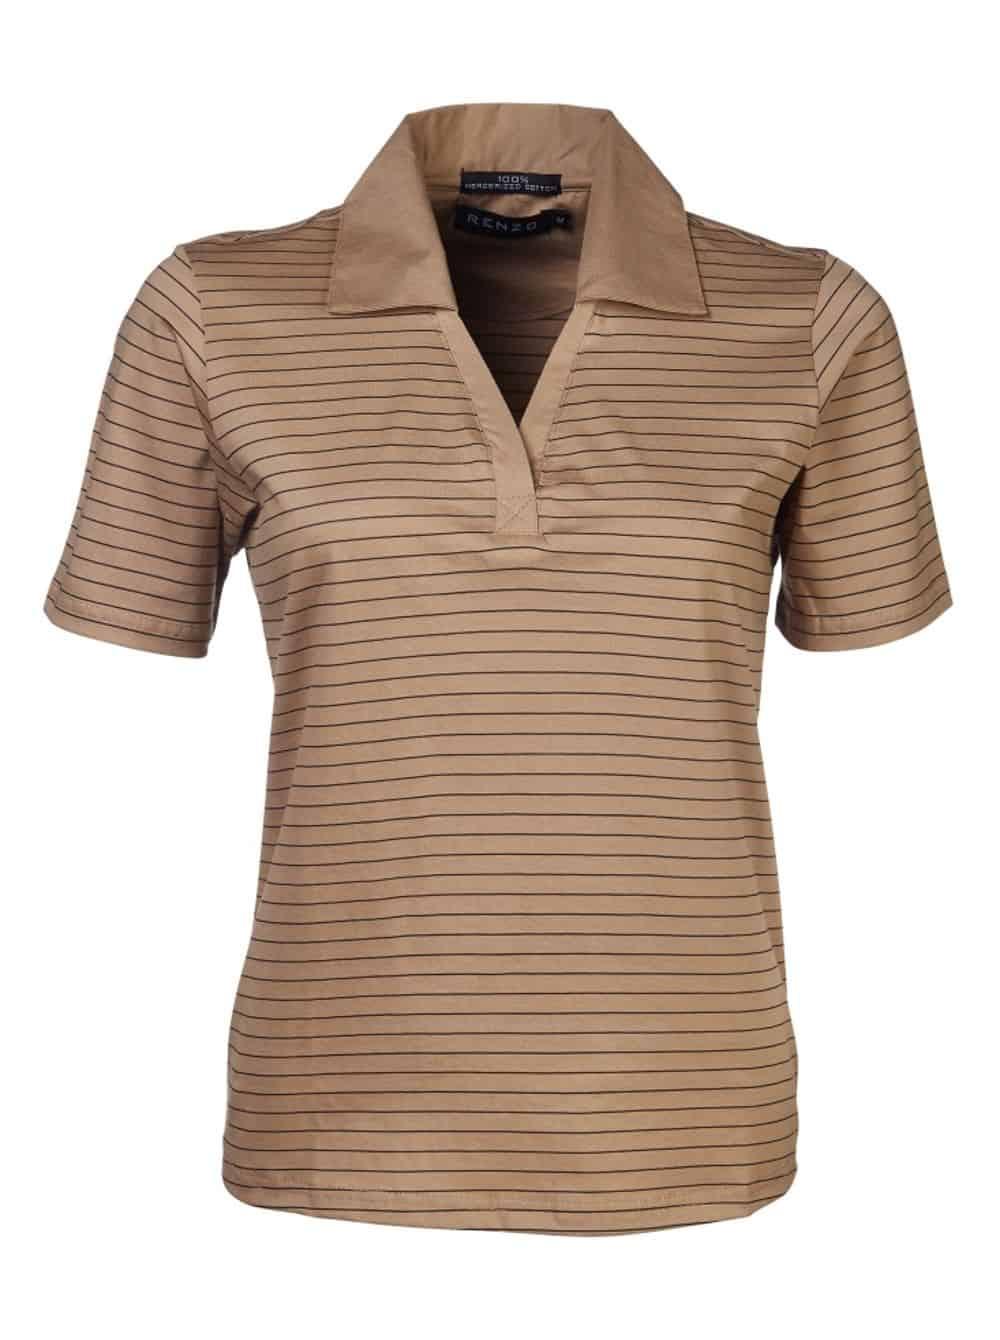 180G Ladies Double Mercerized Yarn Dyed Golfer Golf Shirts